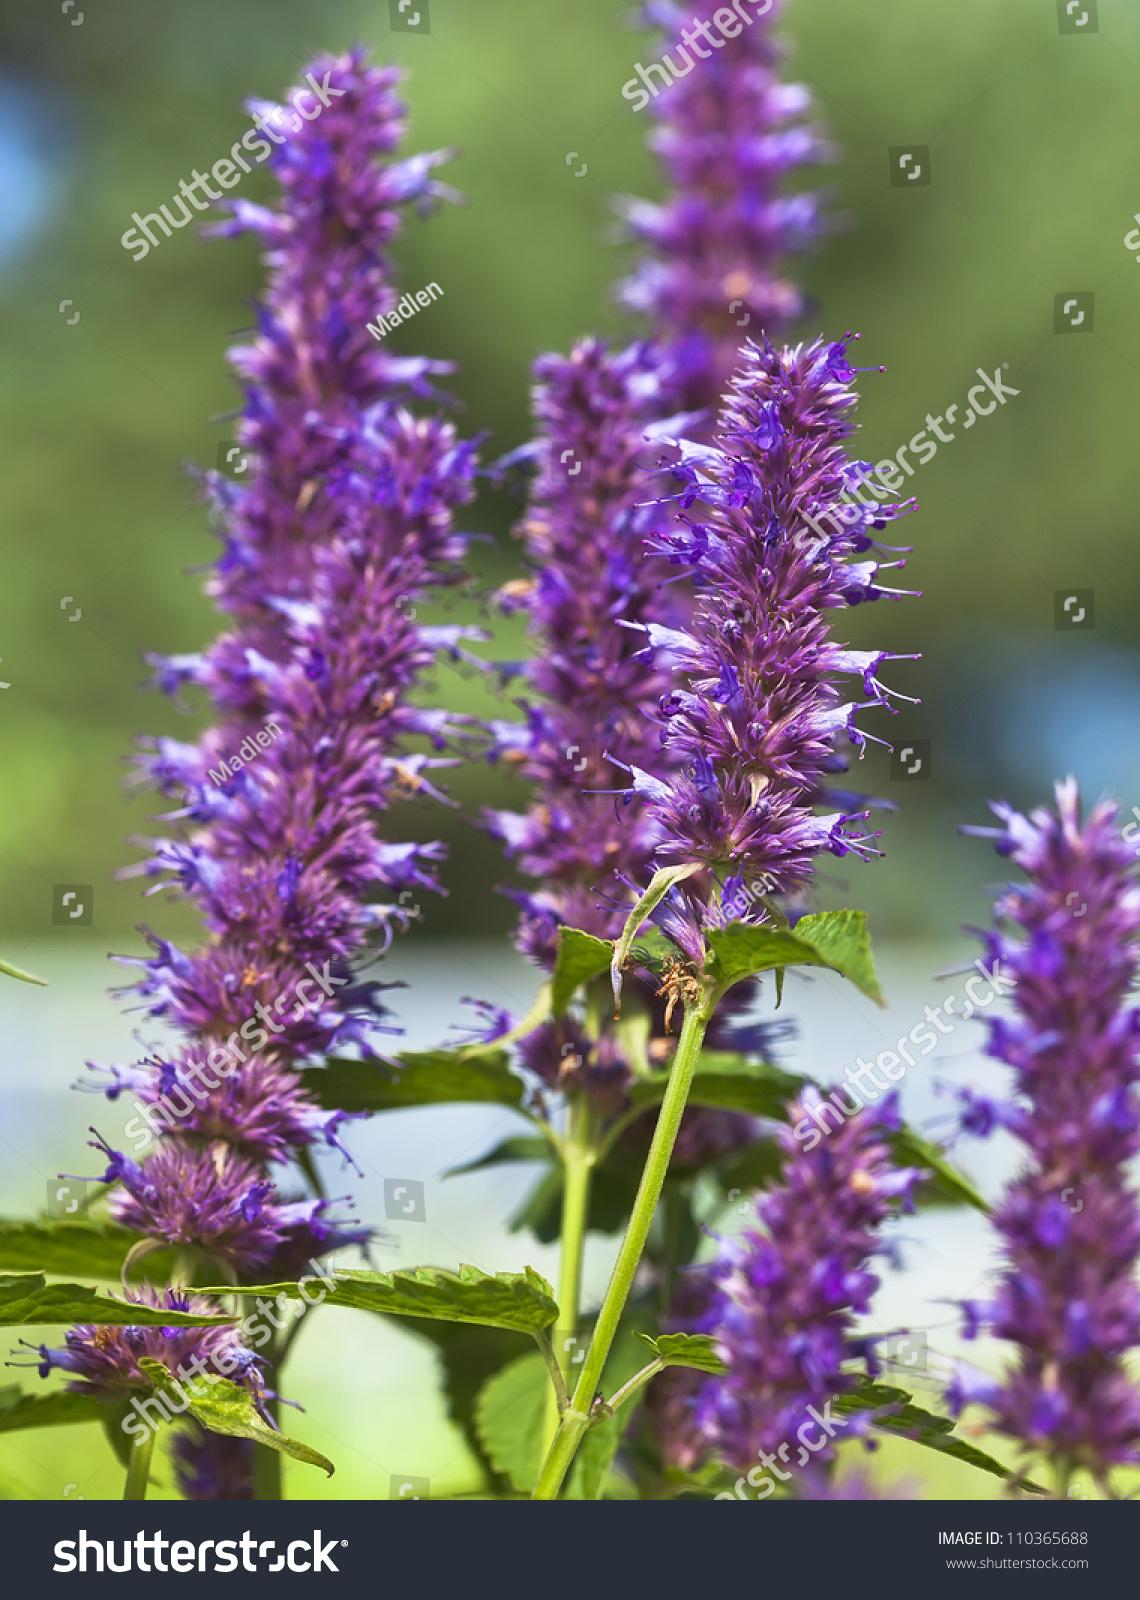 Peppermint Plant Flower Stock Photo 110365688 - Shutterstock